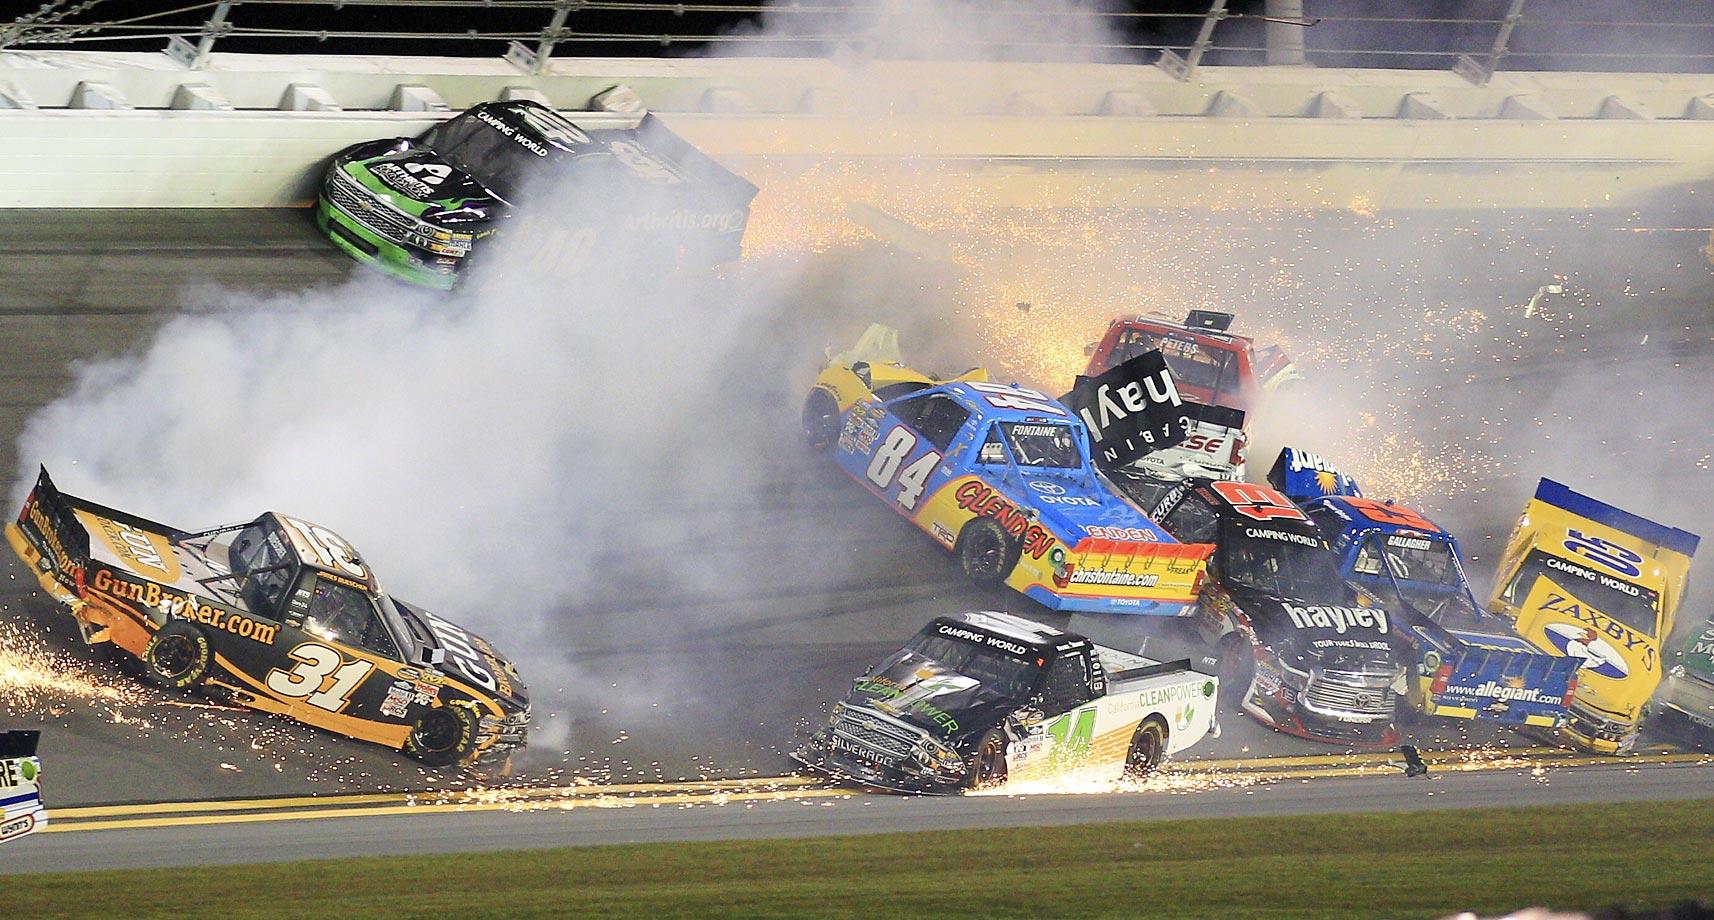 Drivers James Buescher (31), Todd Peck (40), Daniel Hemric (14), Chris Fontaine (84), Timothy Peters (17), Cameron Hayley (13), Spencer Gallagher (23), John Wes Townley (05), crash during the NASCAR Truck series race at Daytona International Speedway.